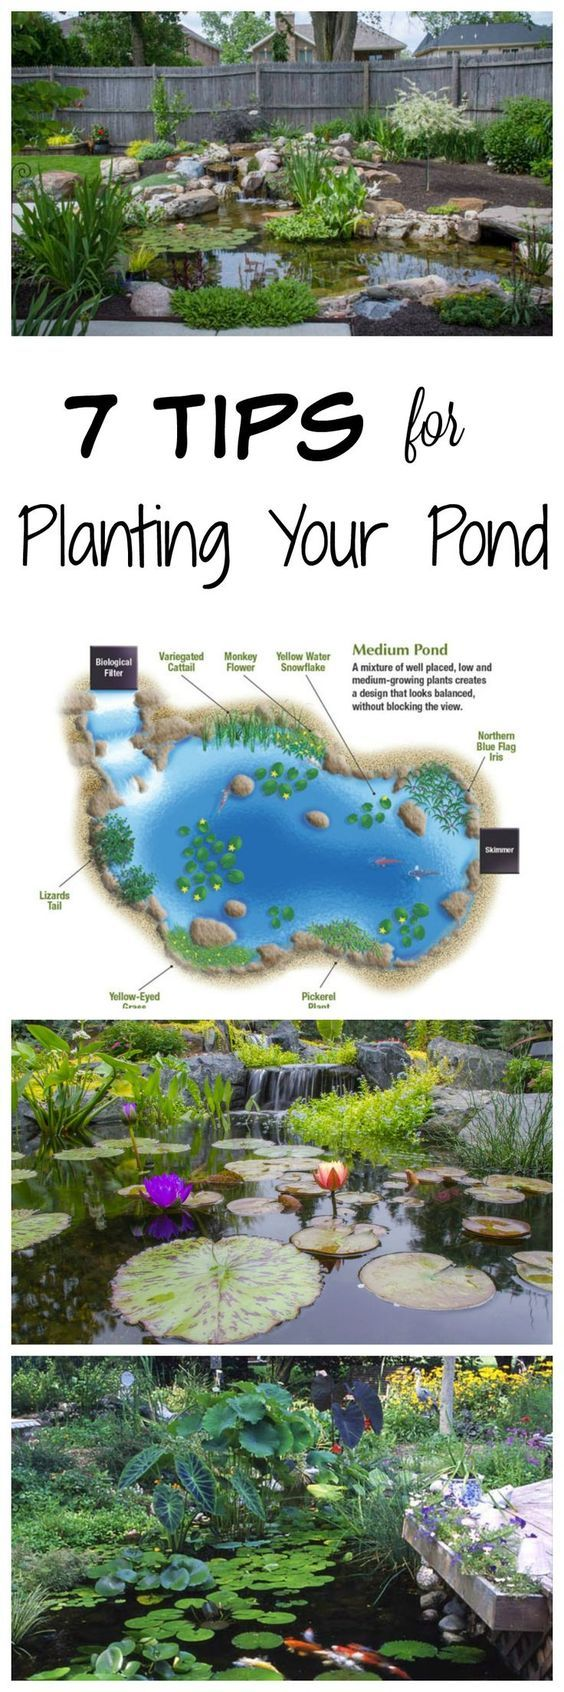 Koi in atlanta as well as fine koi pond design amp supplies atlanta - 7 Tips For Planting Your Pond